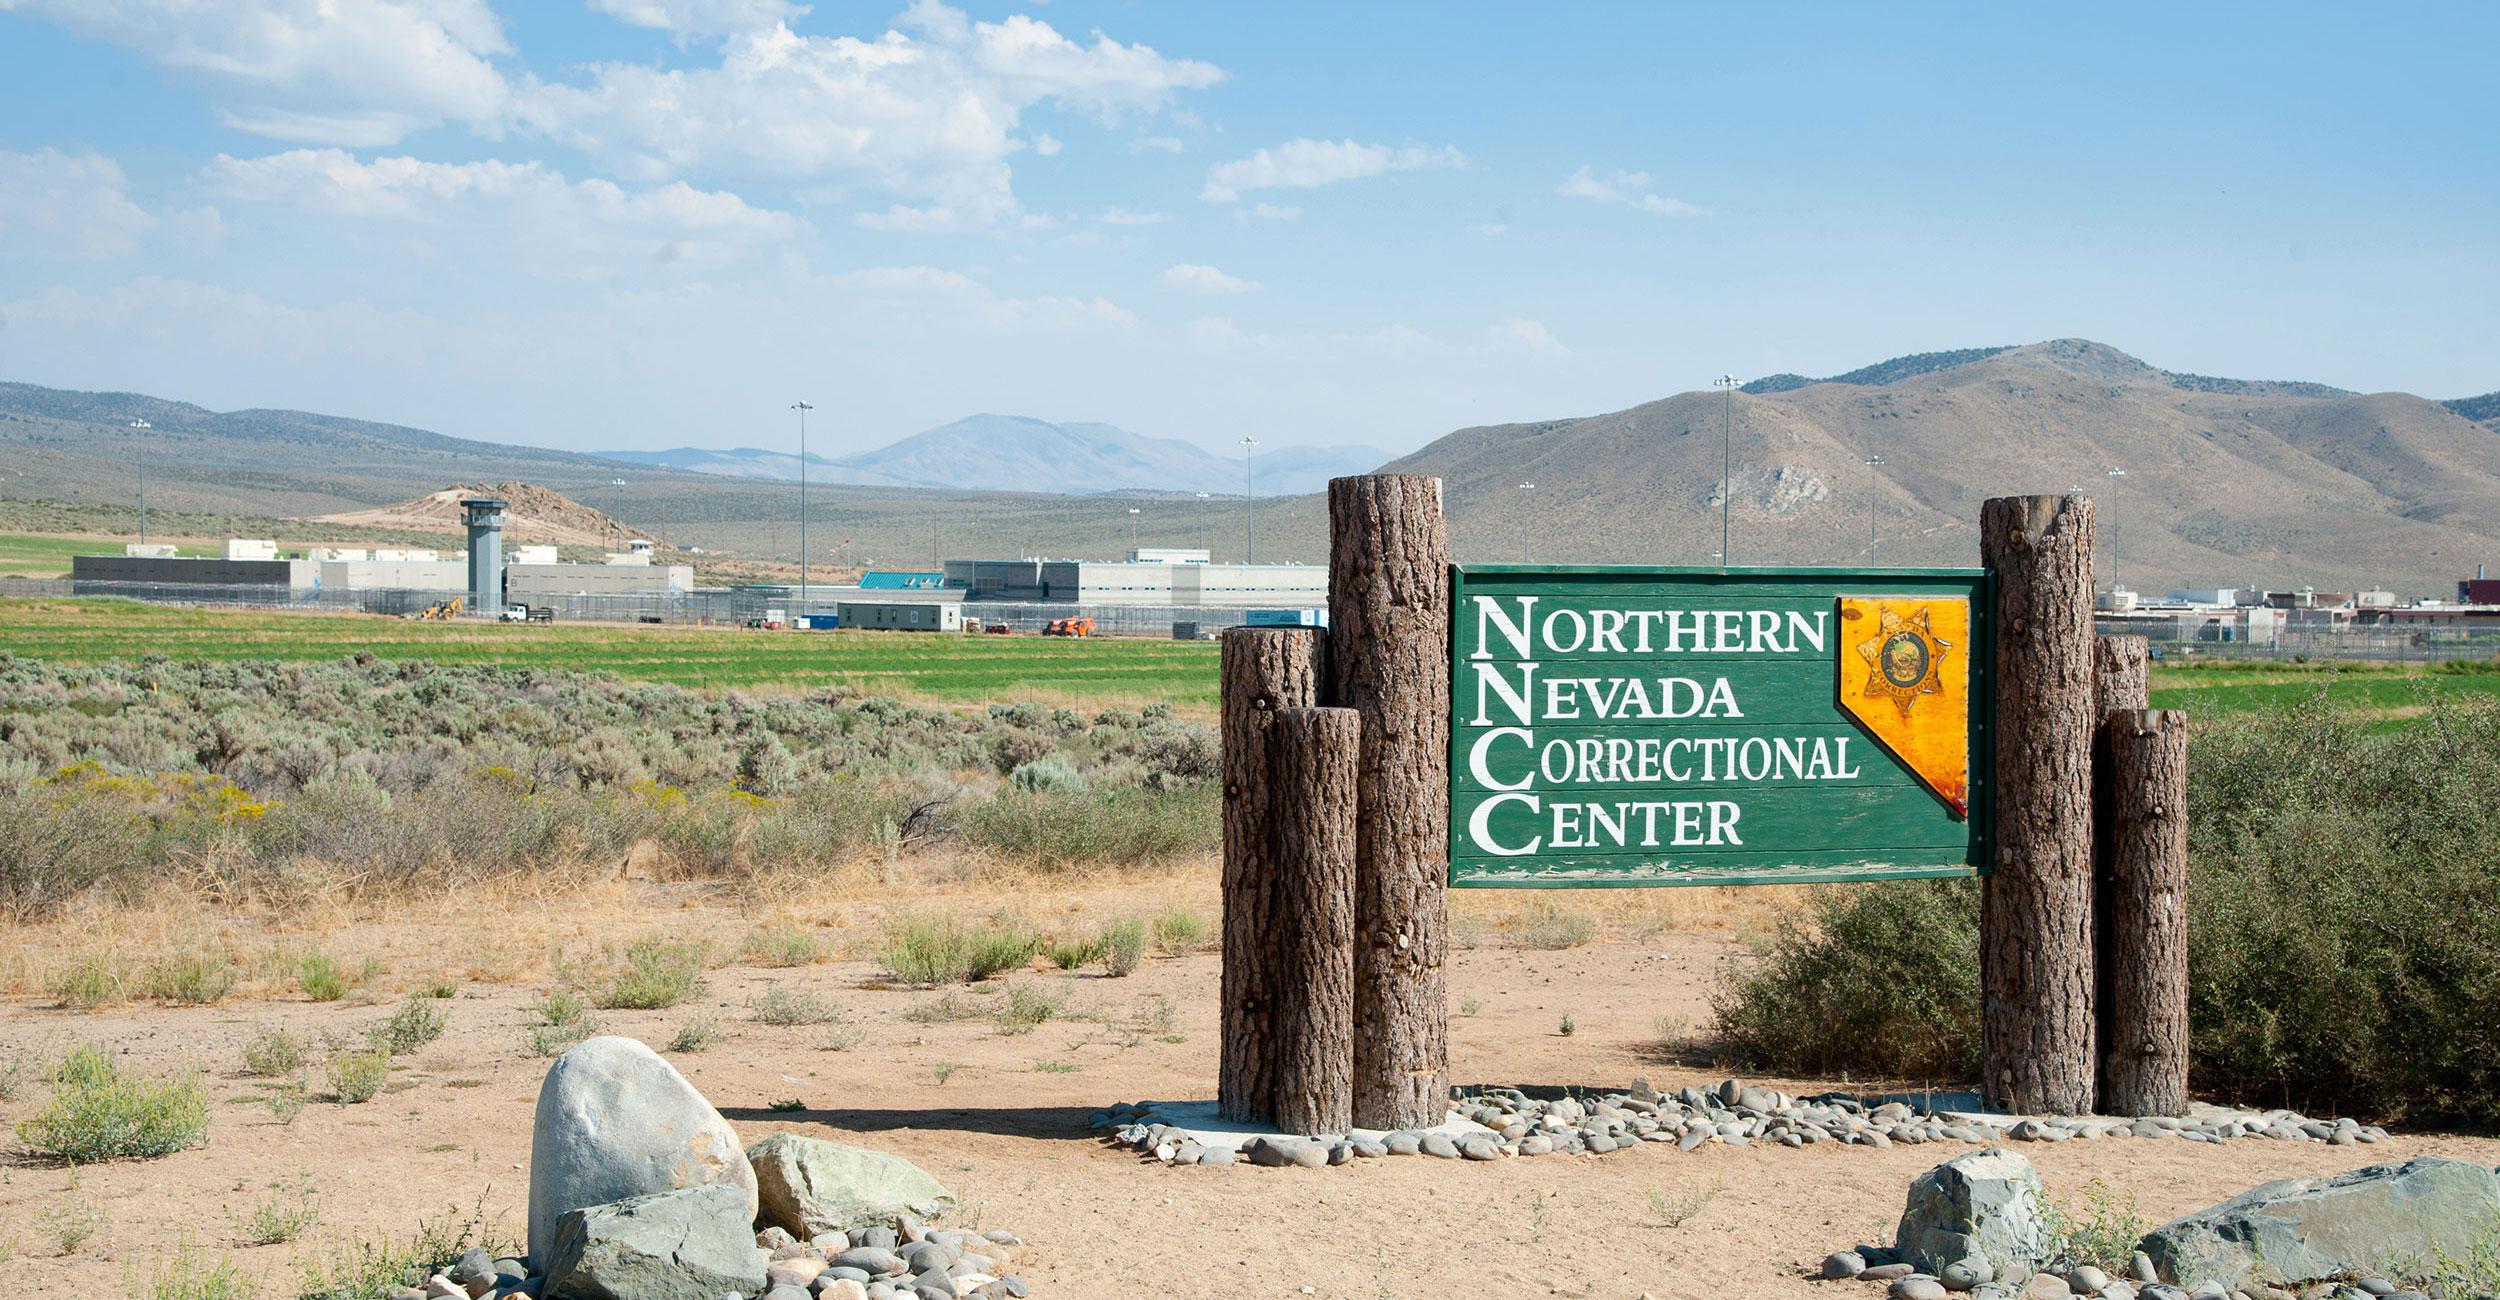 NORTHERN_NEVADA_CORRECTIONAL.jpg